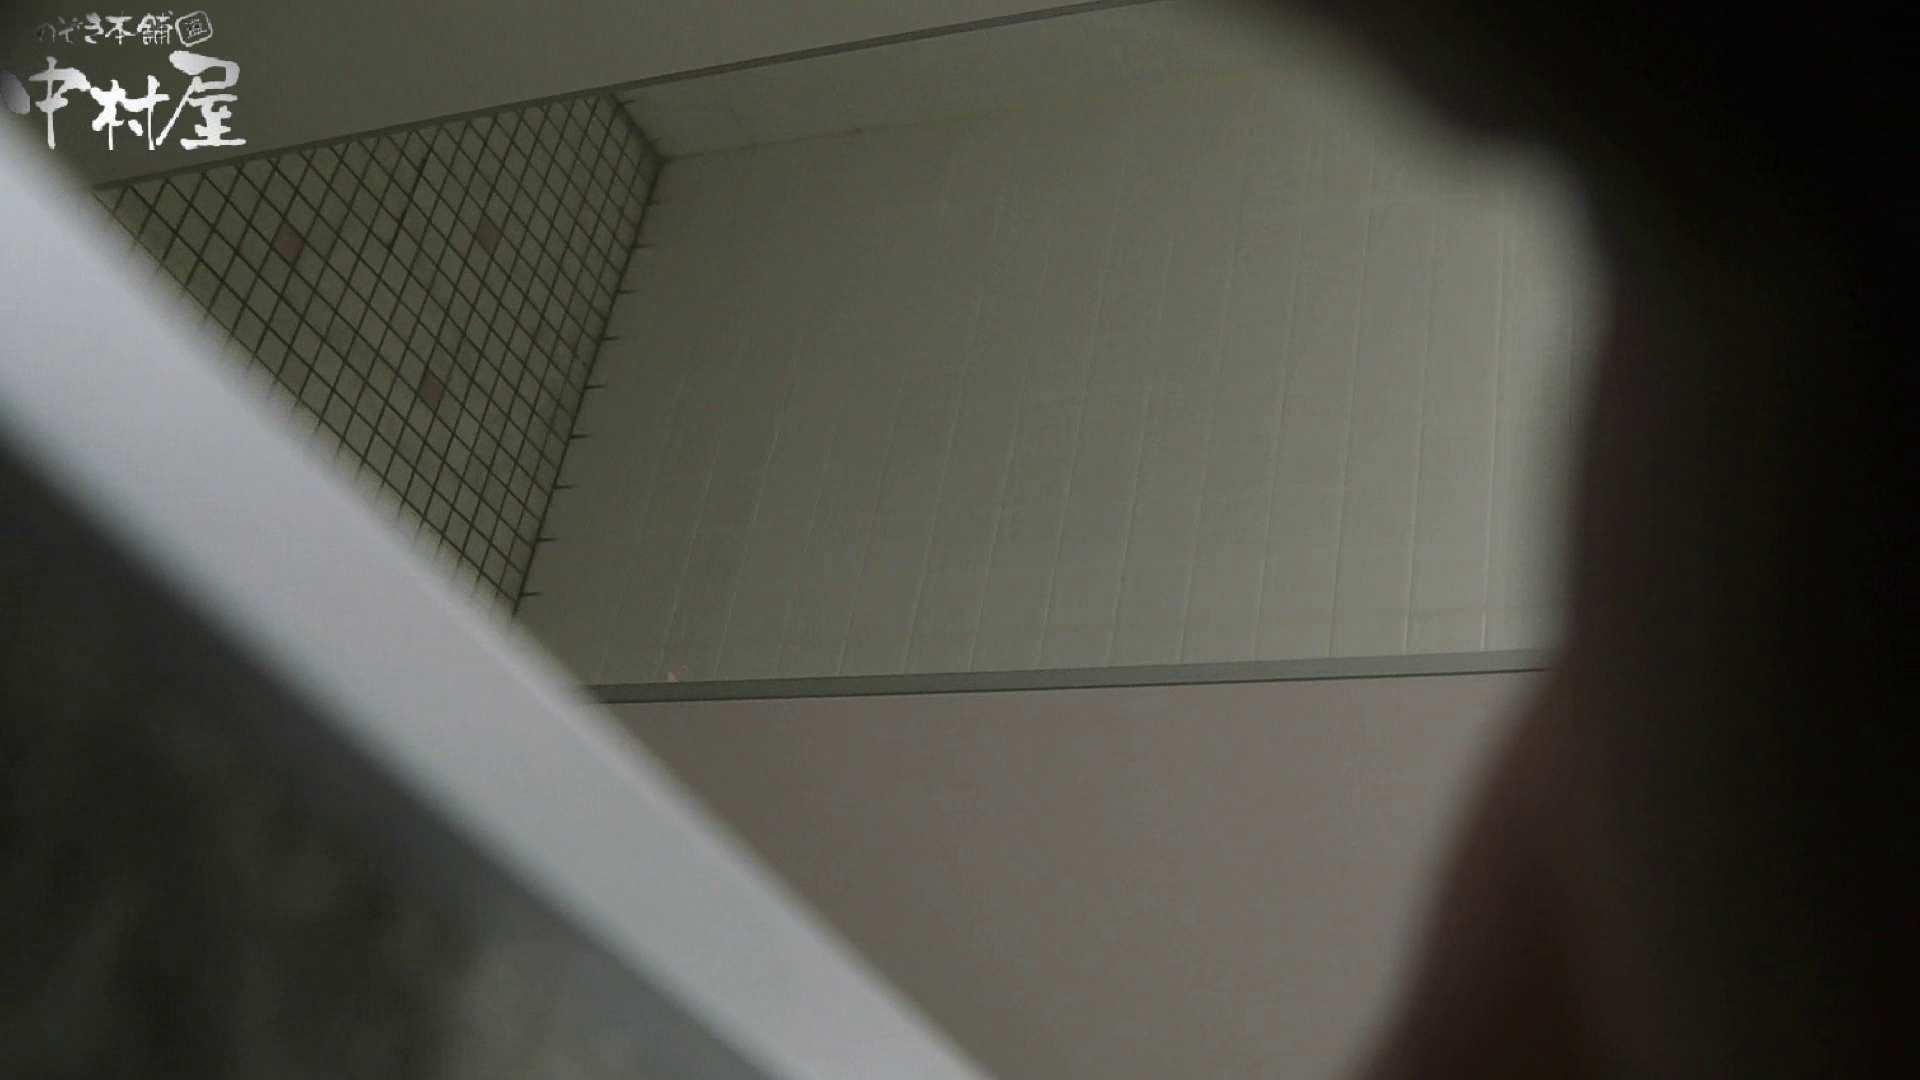 vol.34 命がけ潜伏洗面所! アソコの毛が長髪な件 プライベート AV無料動画キャプチャ 72連発 39